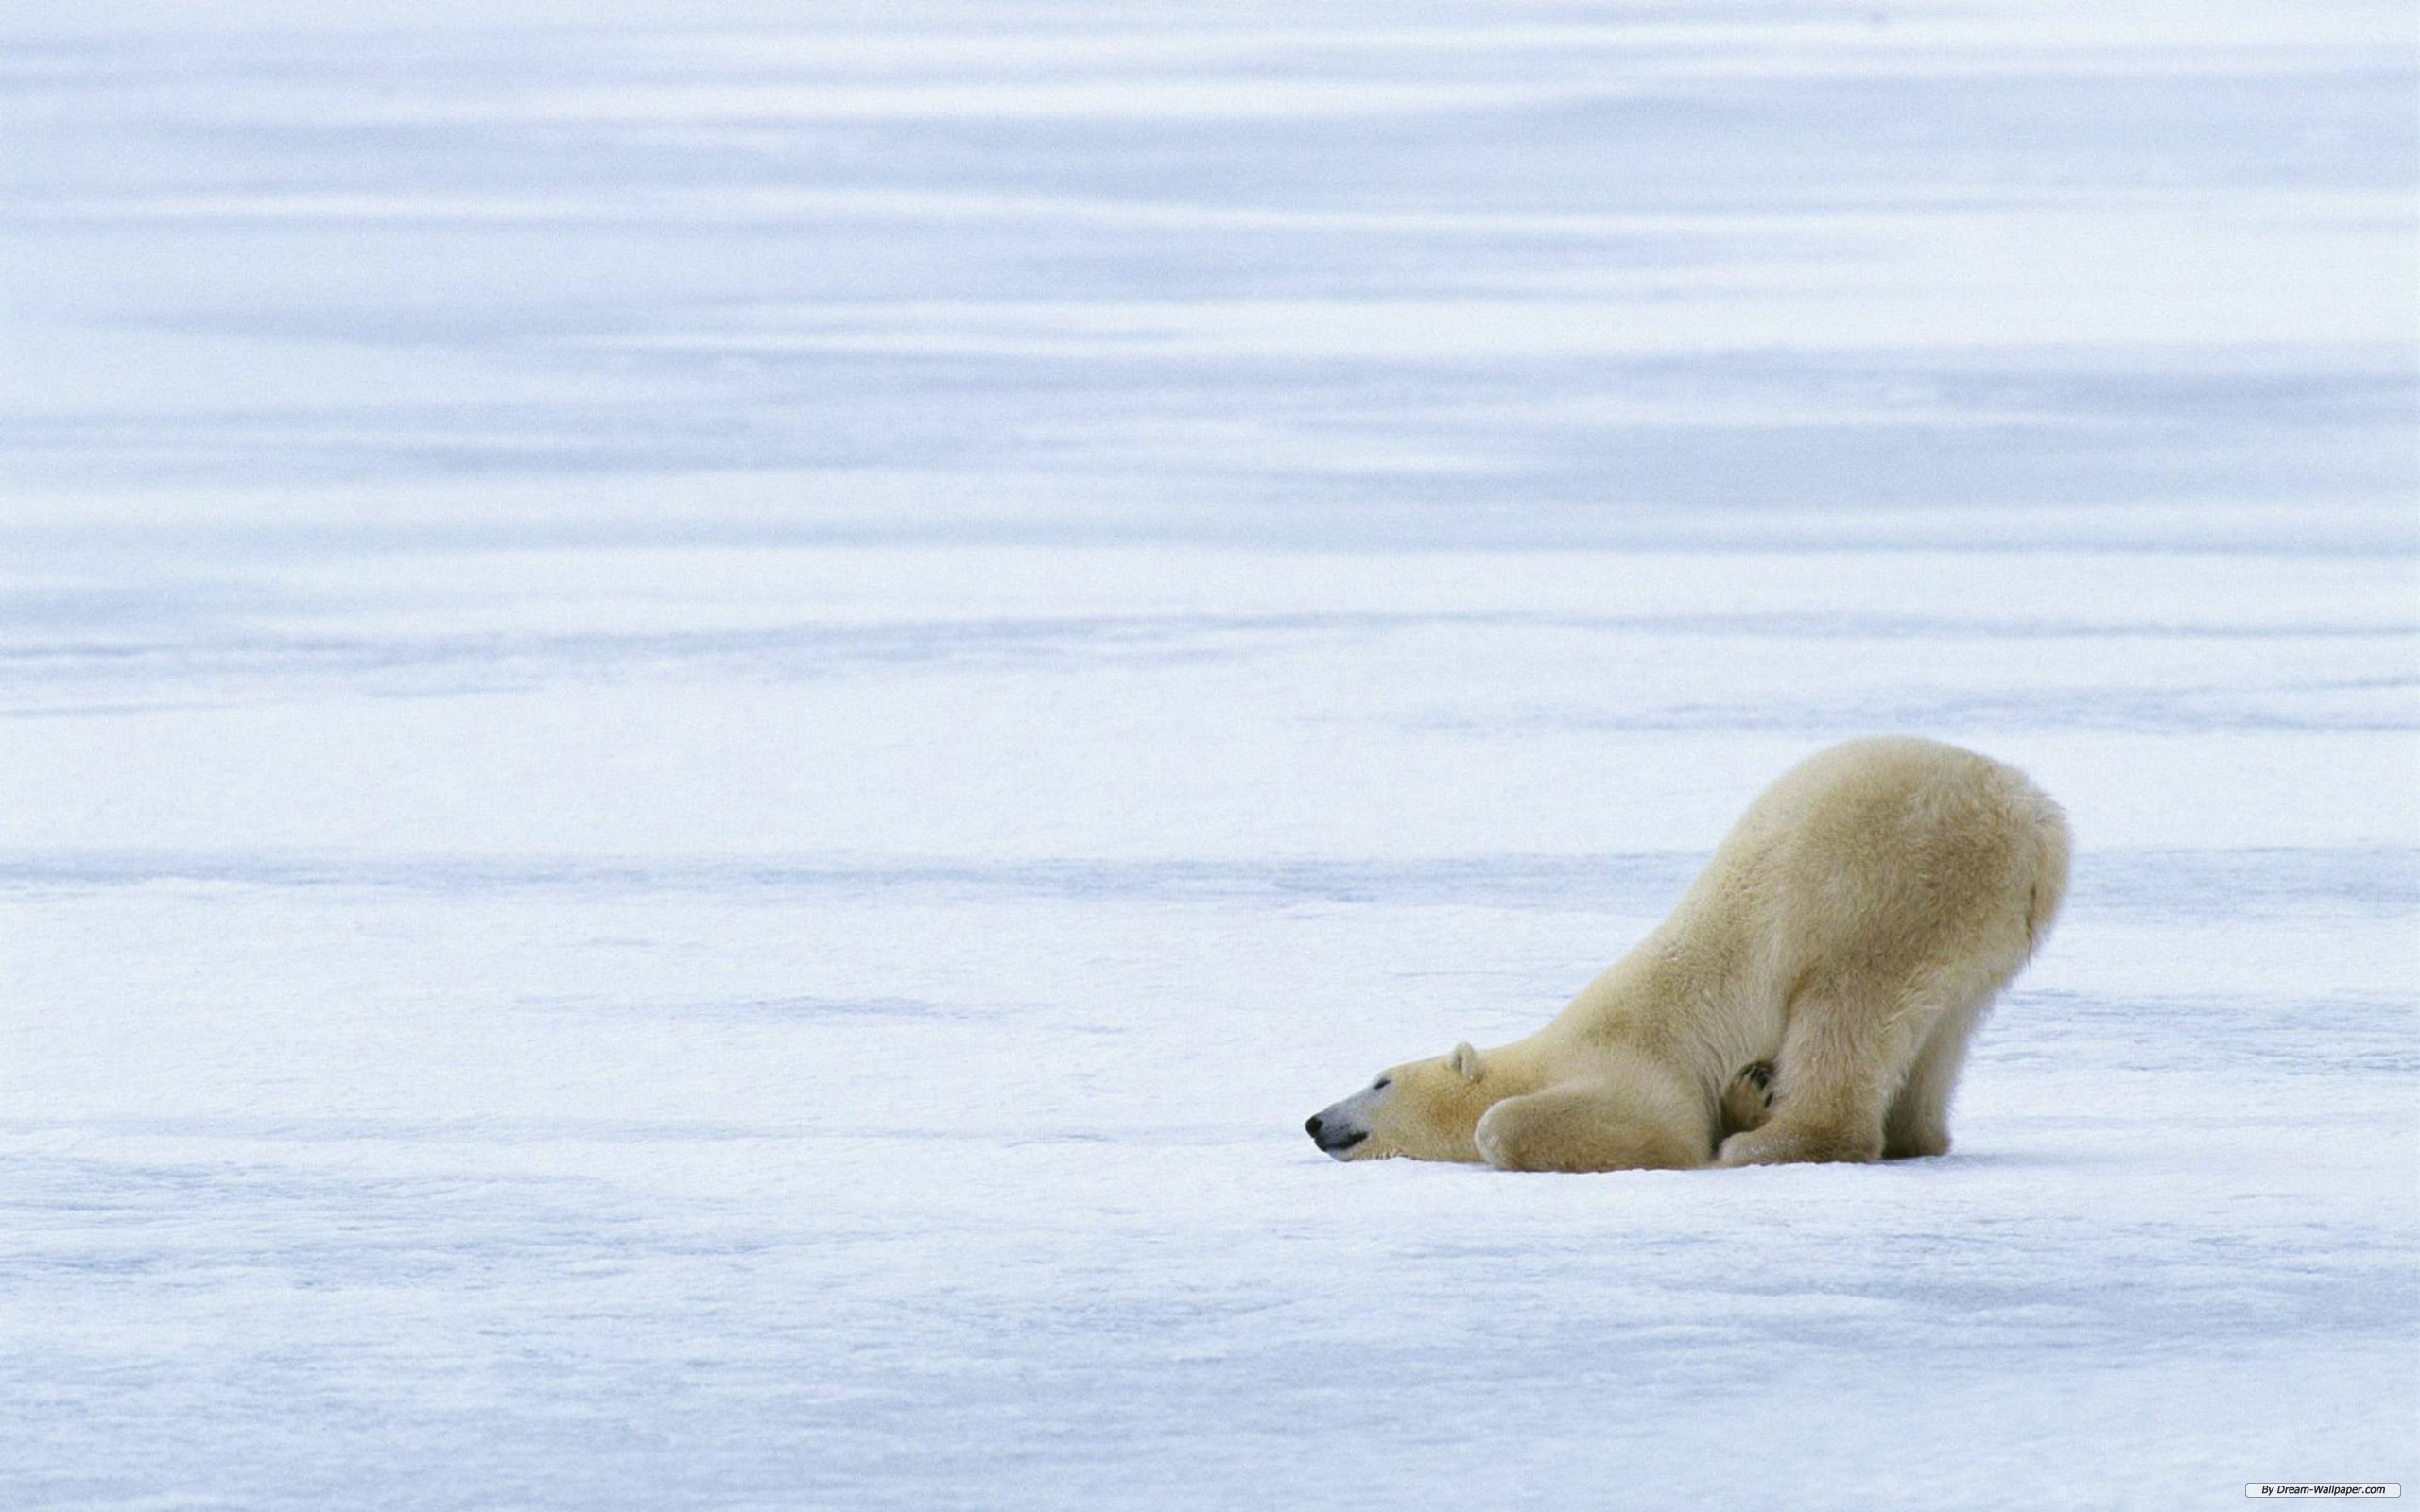 polar bear full hd wallpaper and background image | 2560x1600 | id